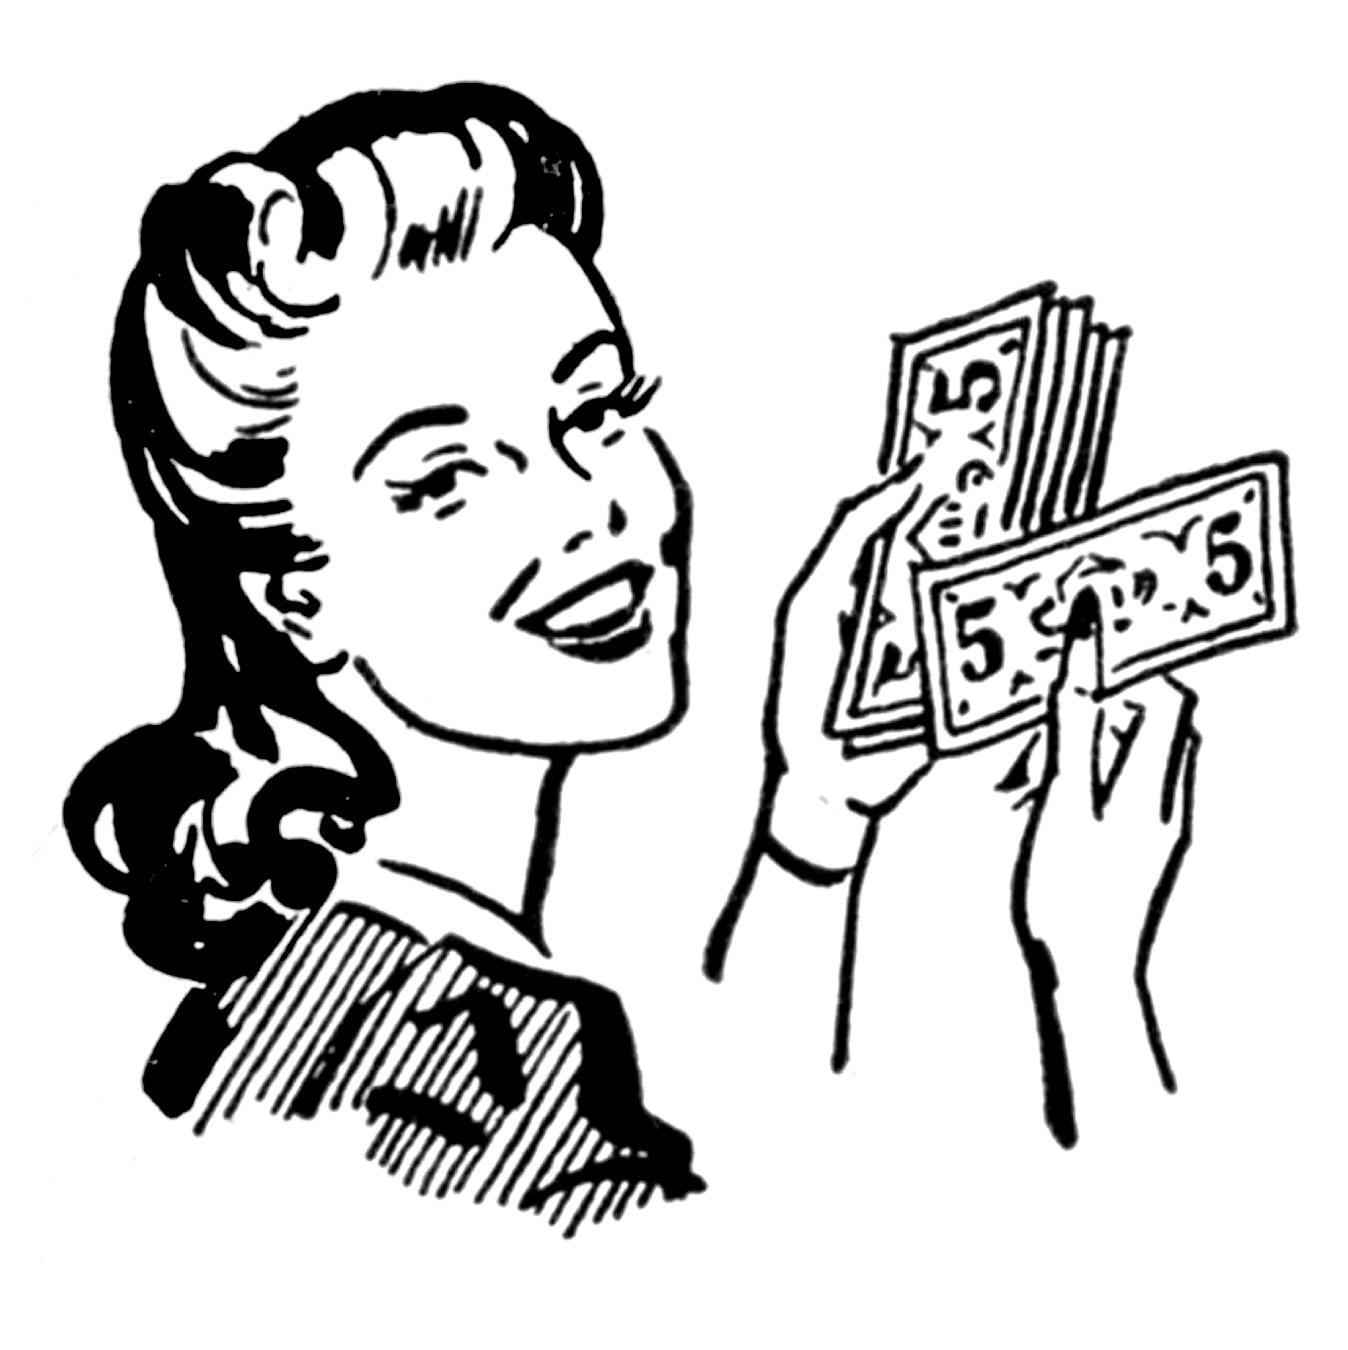 Retro clip art money moms women the graphics fairy